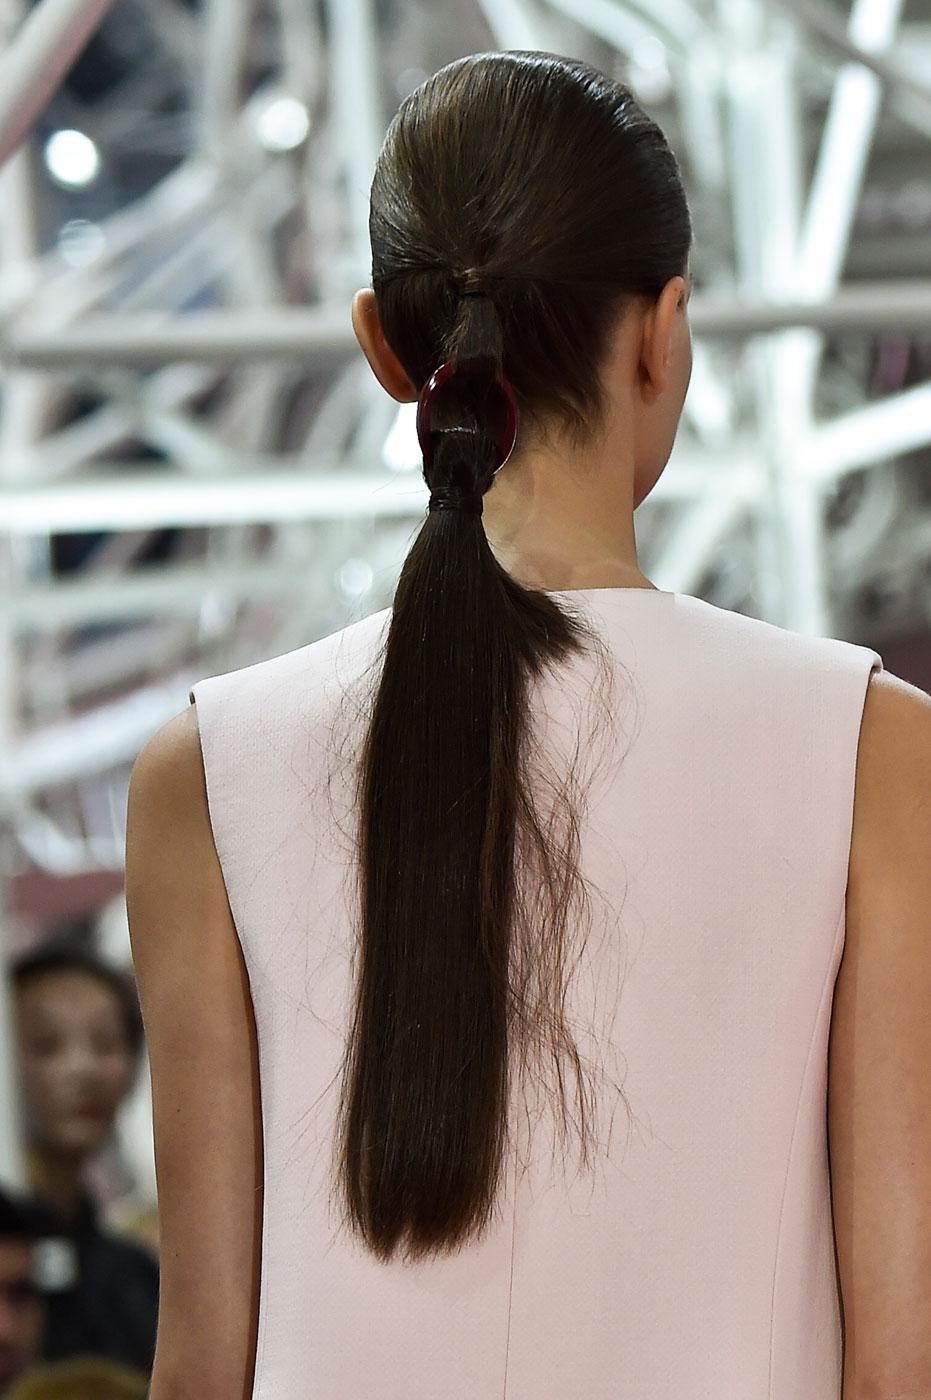 Christian-Dior-fashion-runway-show-close-ups-haute-couture-paris-spring-summer-2015-the-impression-114